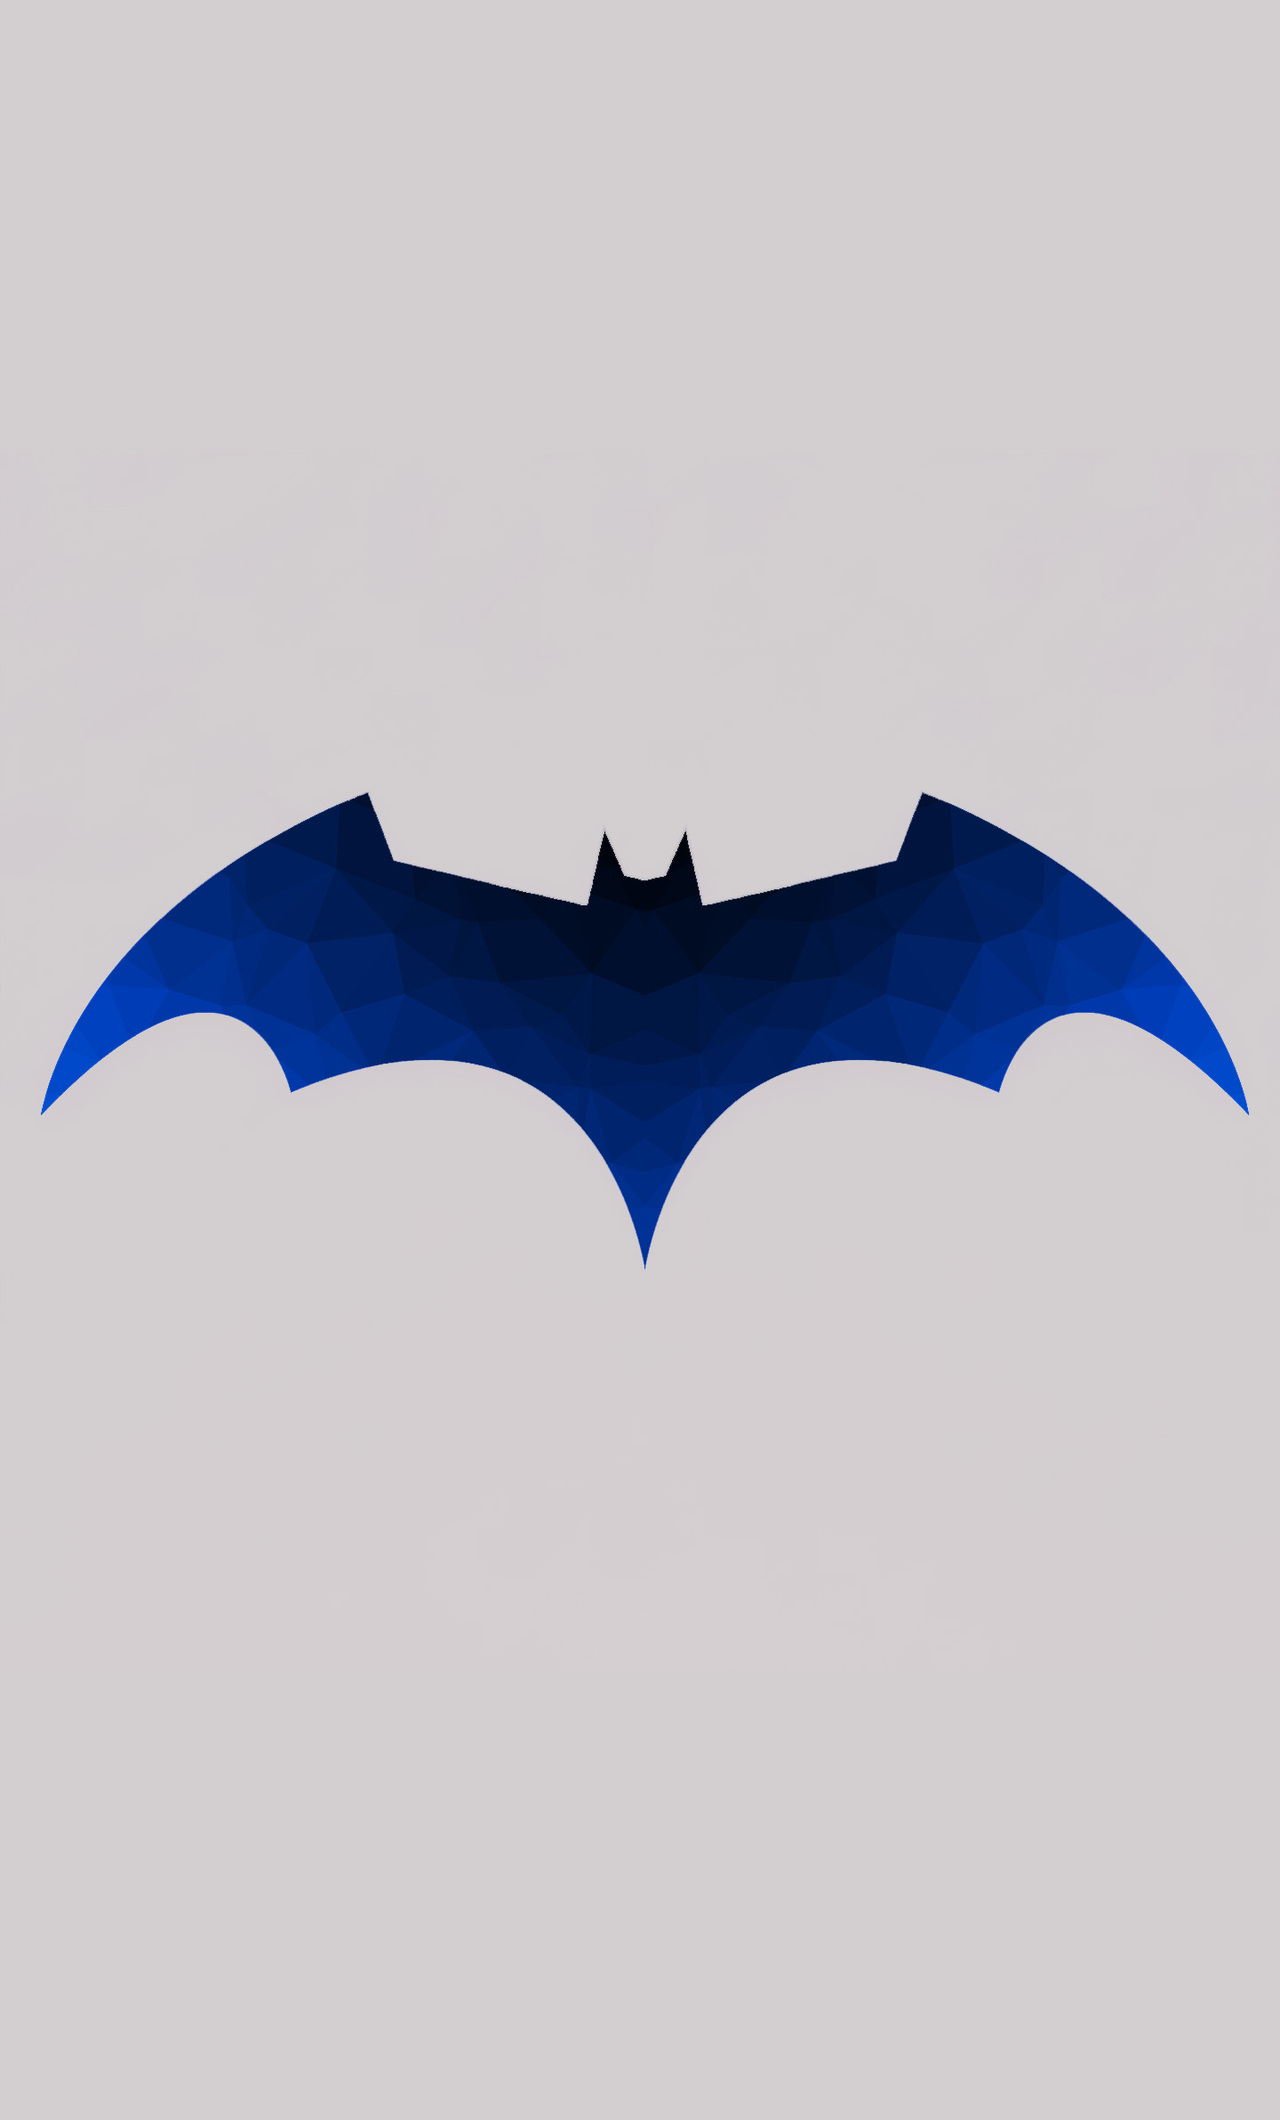 1280x2120 Low Polygon Batman Logo Iphone 6 Hd 4k Wallpapers